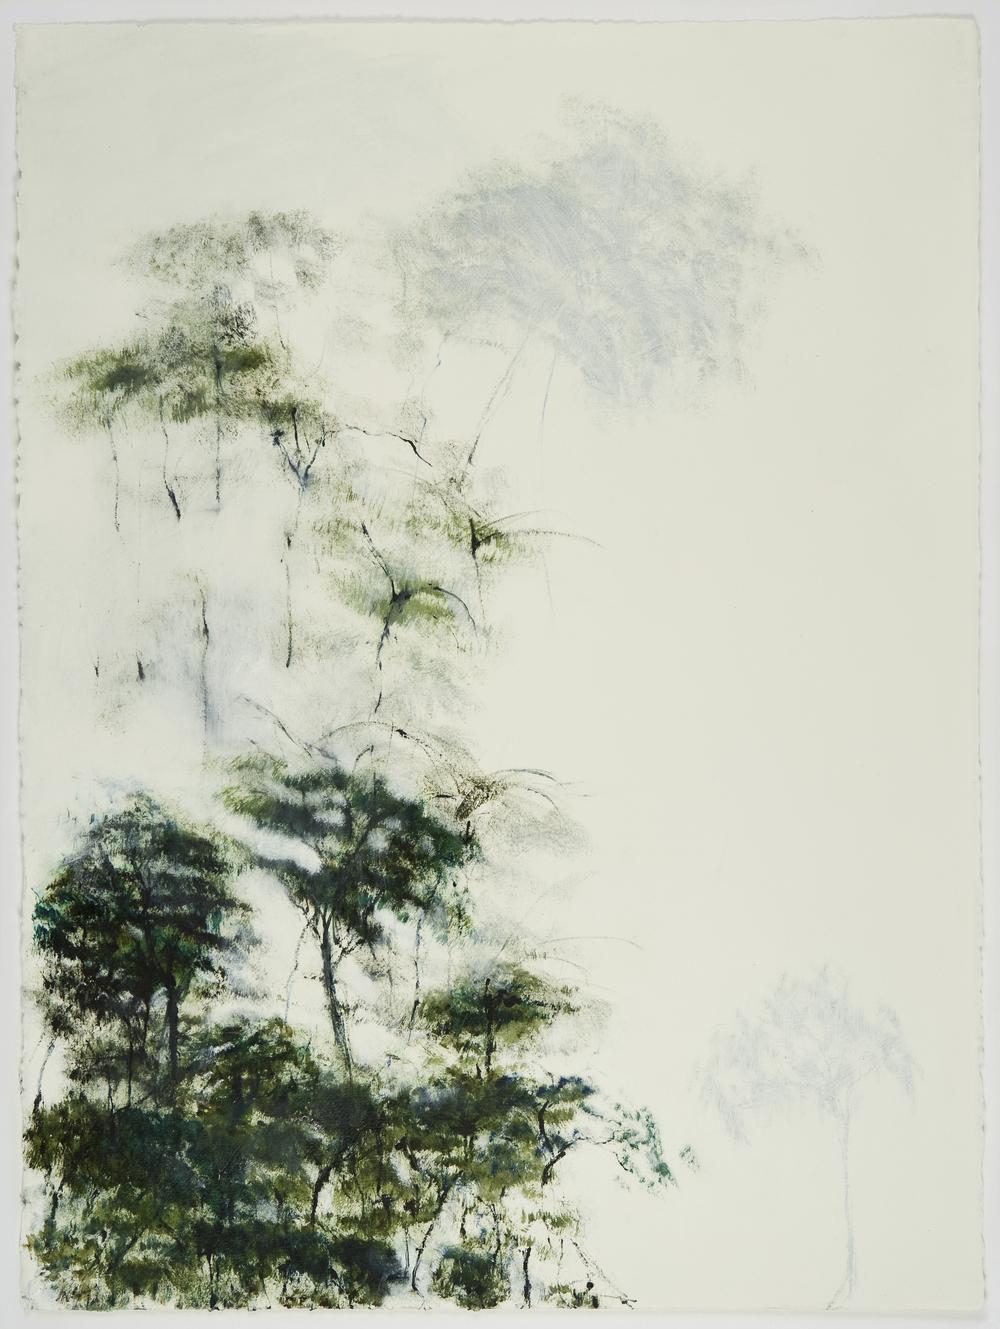 Trees and Fog 1 LG.jpg